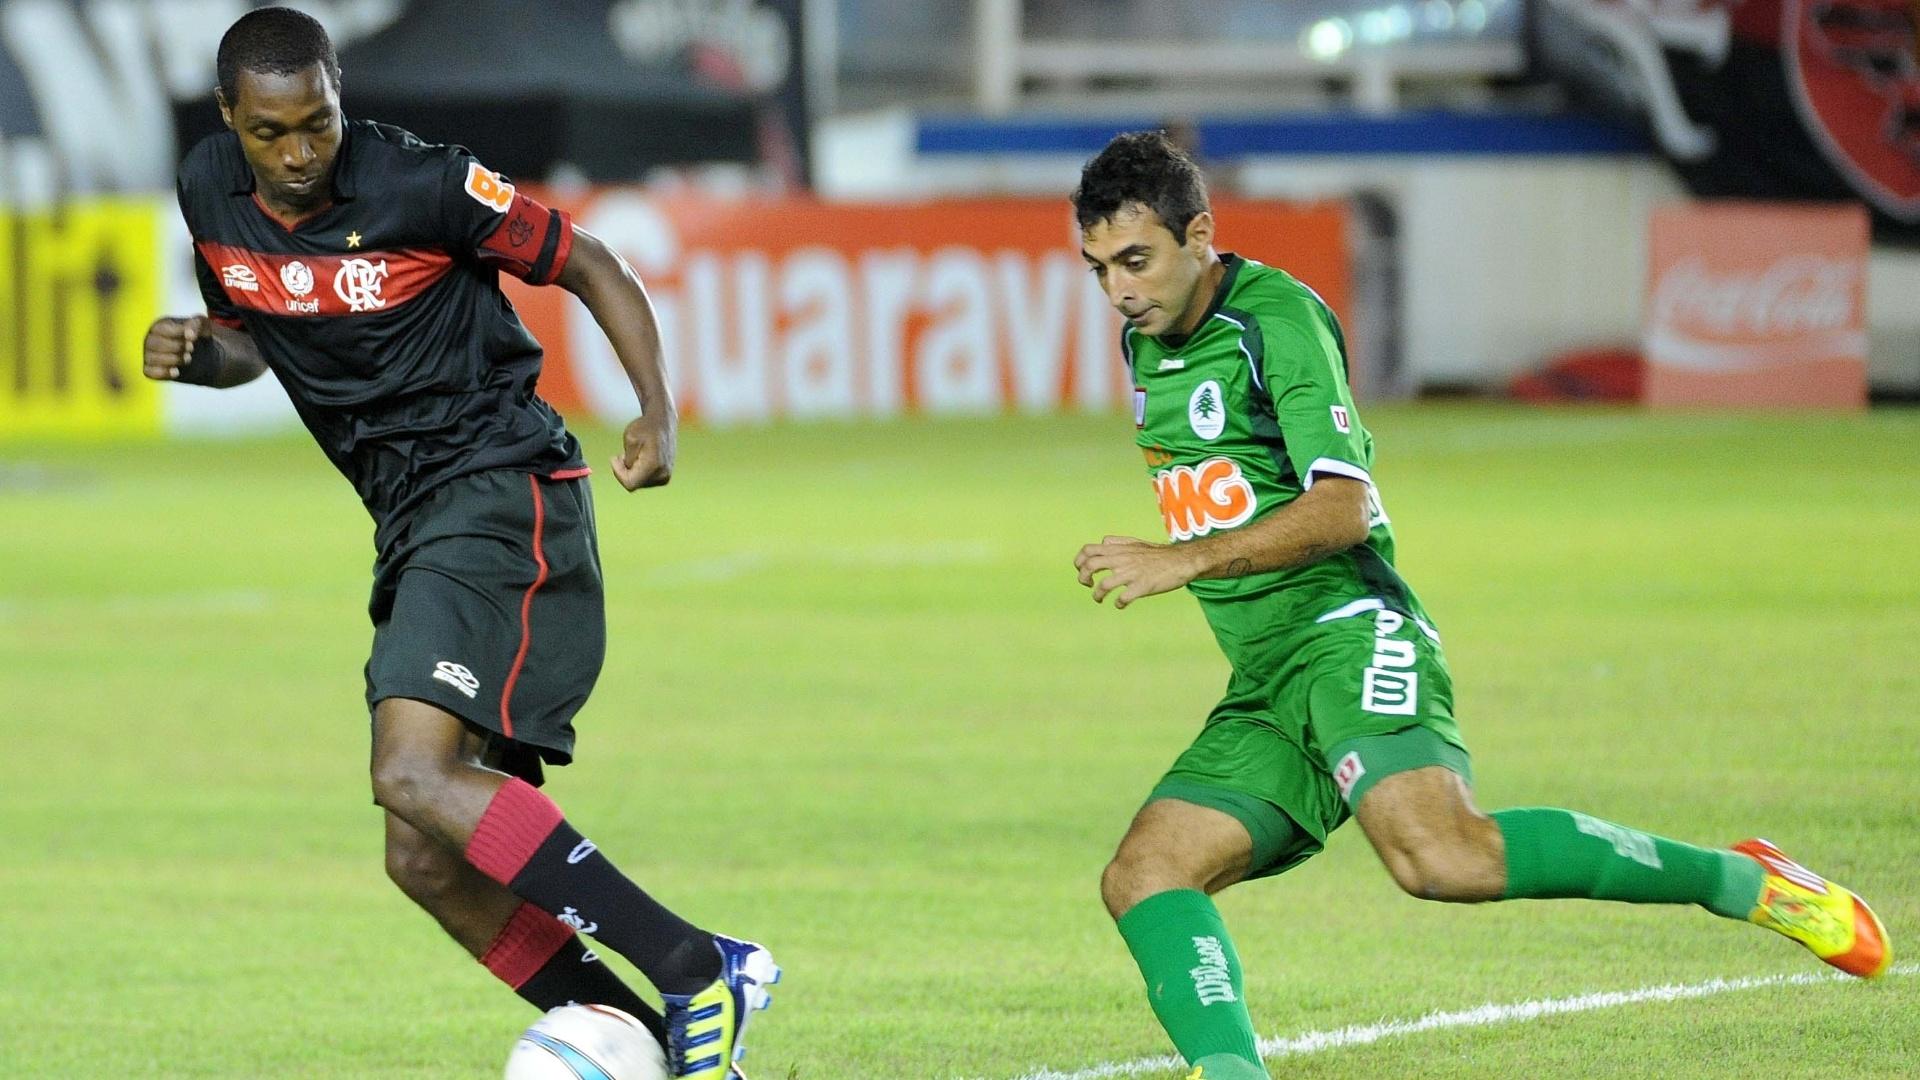 Renato Abreu, do Flamengo, conduz a bola durante a derrota para o Boavista